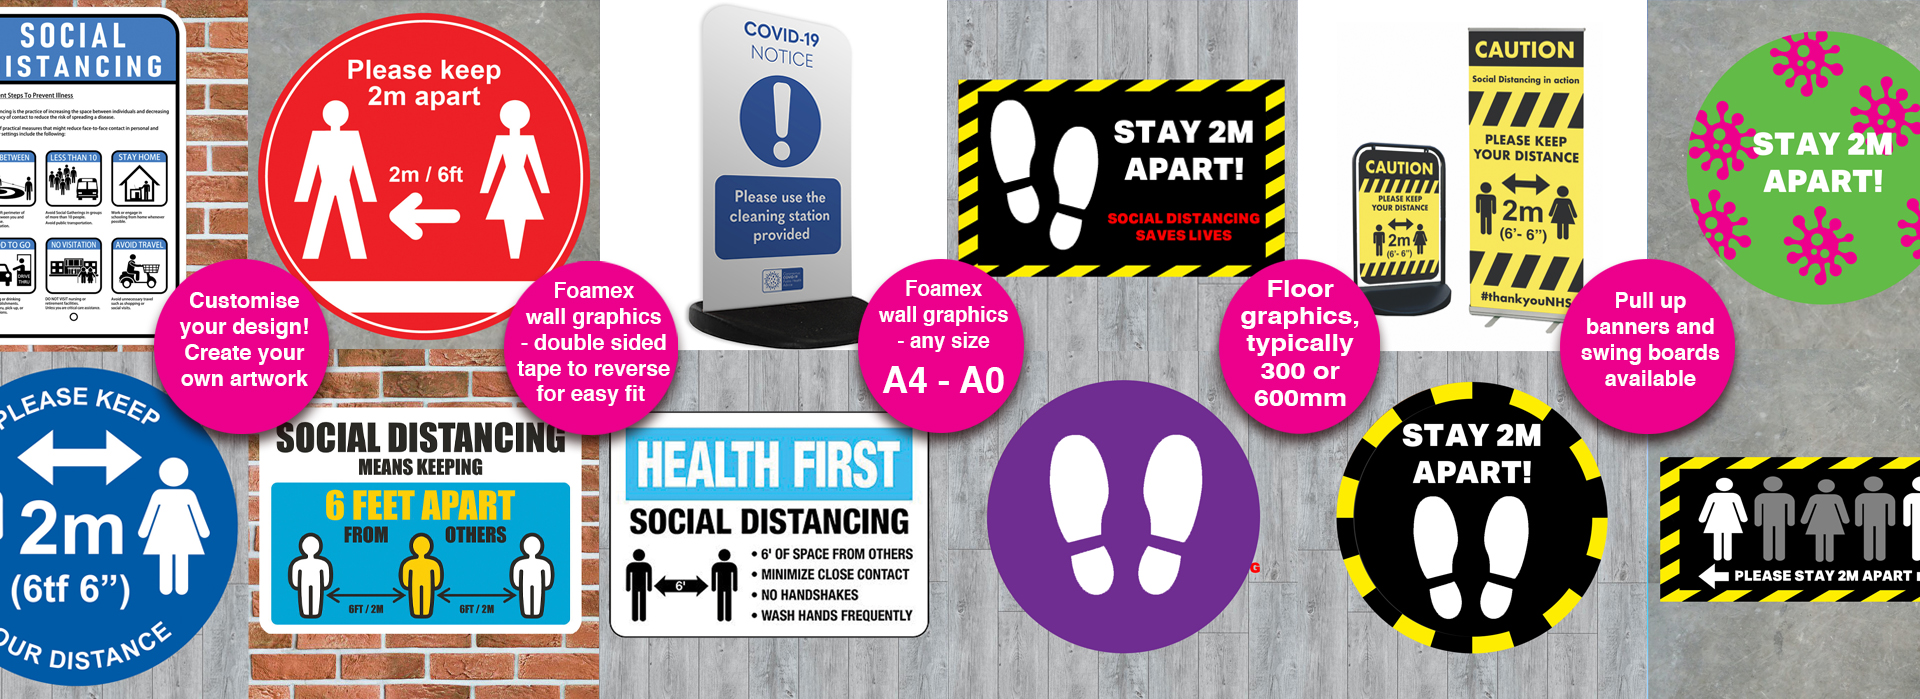 COVID-19 Social Distancing Graphics